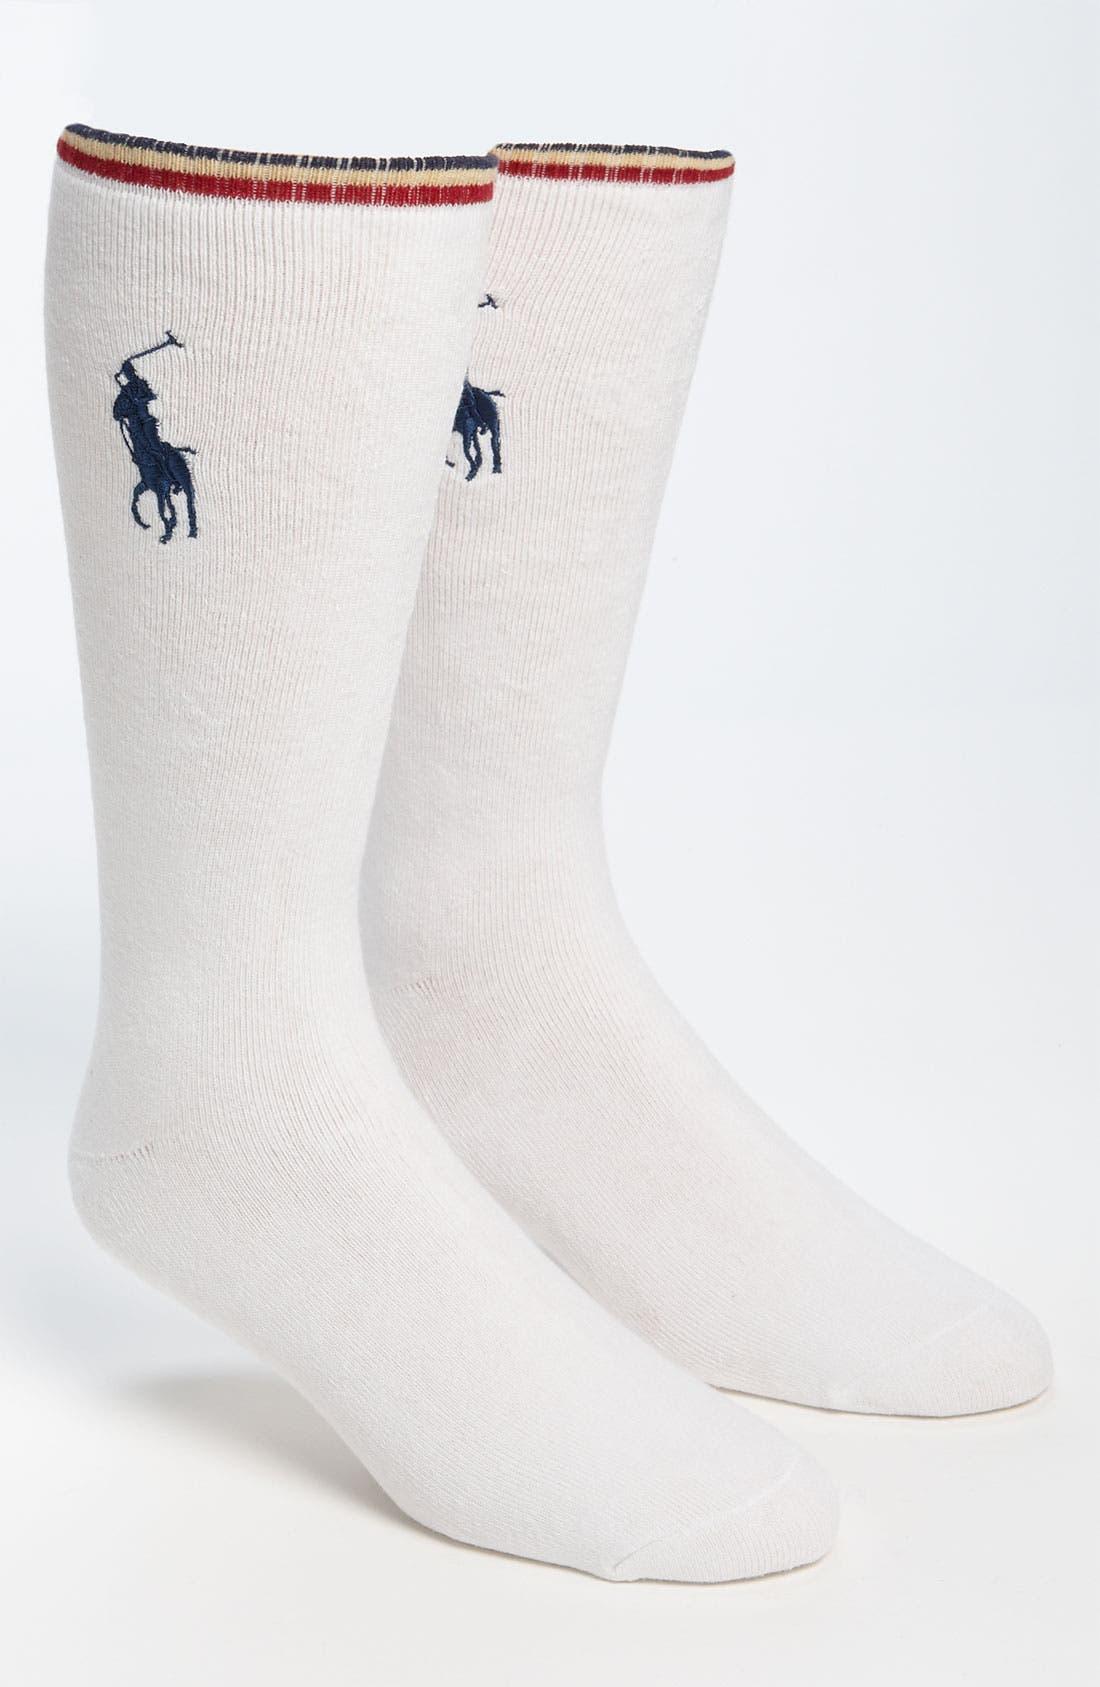 Main Image - Polo Ralph Lauren Cushion Socks (2-Pack)